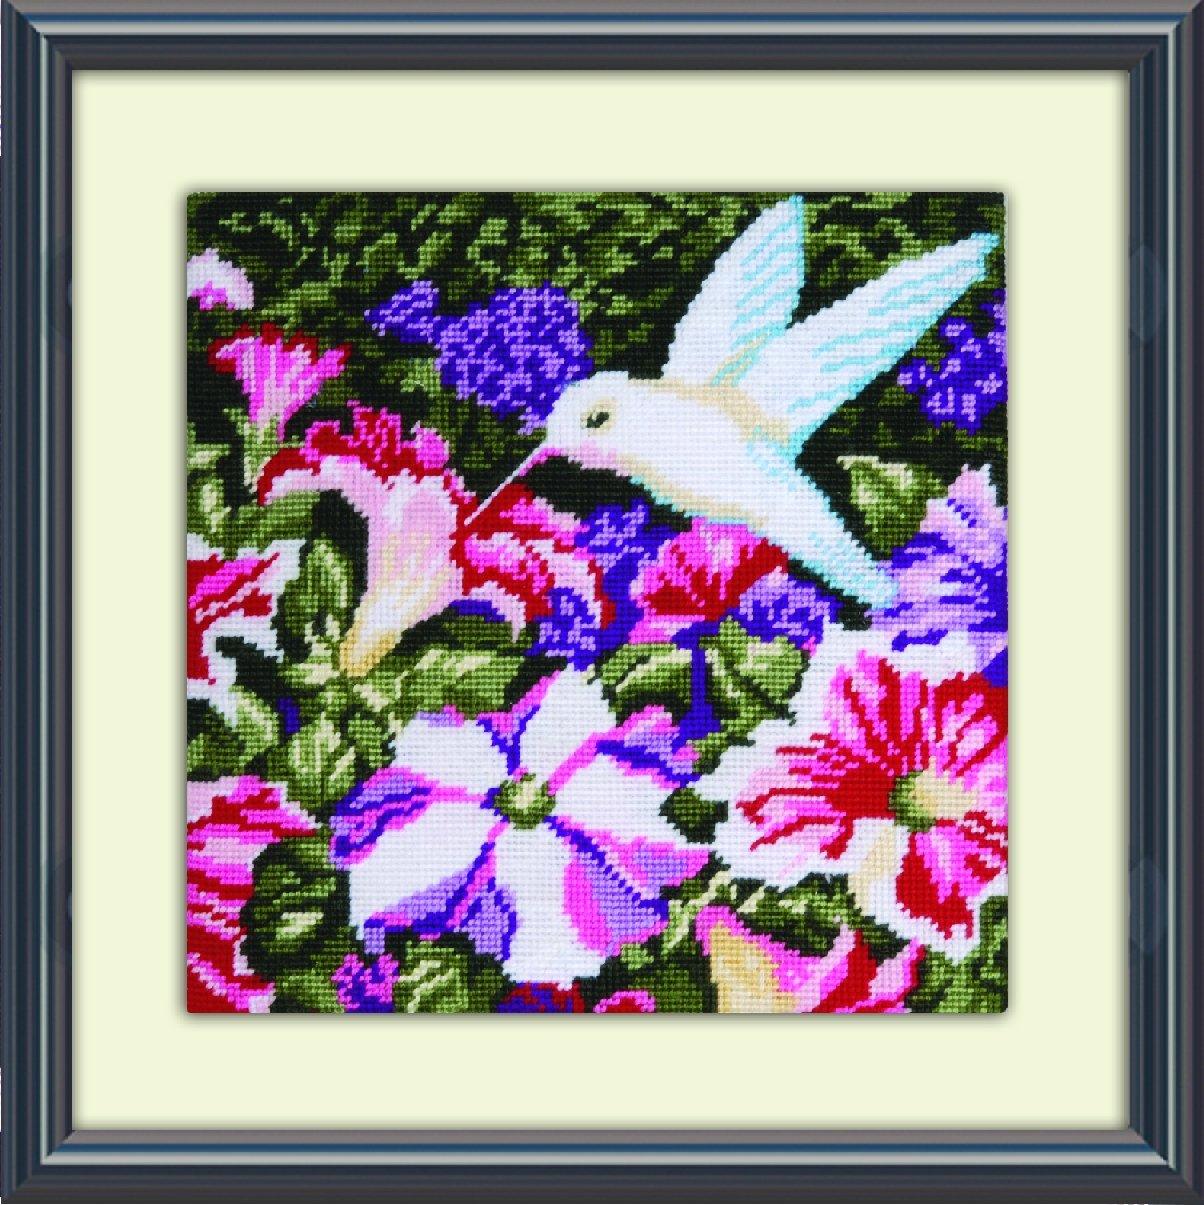 10 by 10-Inch Tobin DW2520 Needlepoint Kit Hummingbirds